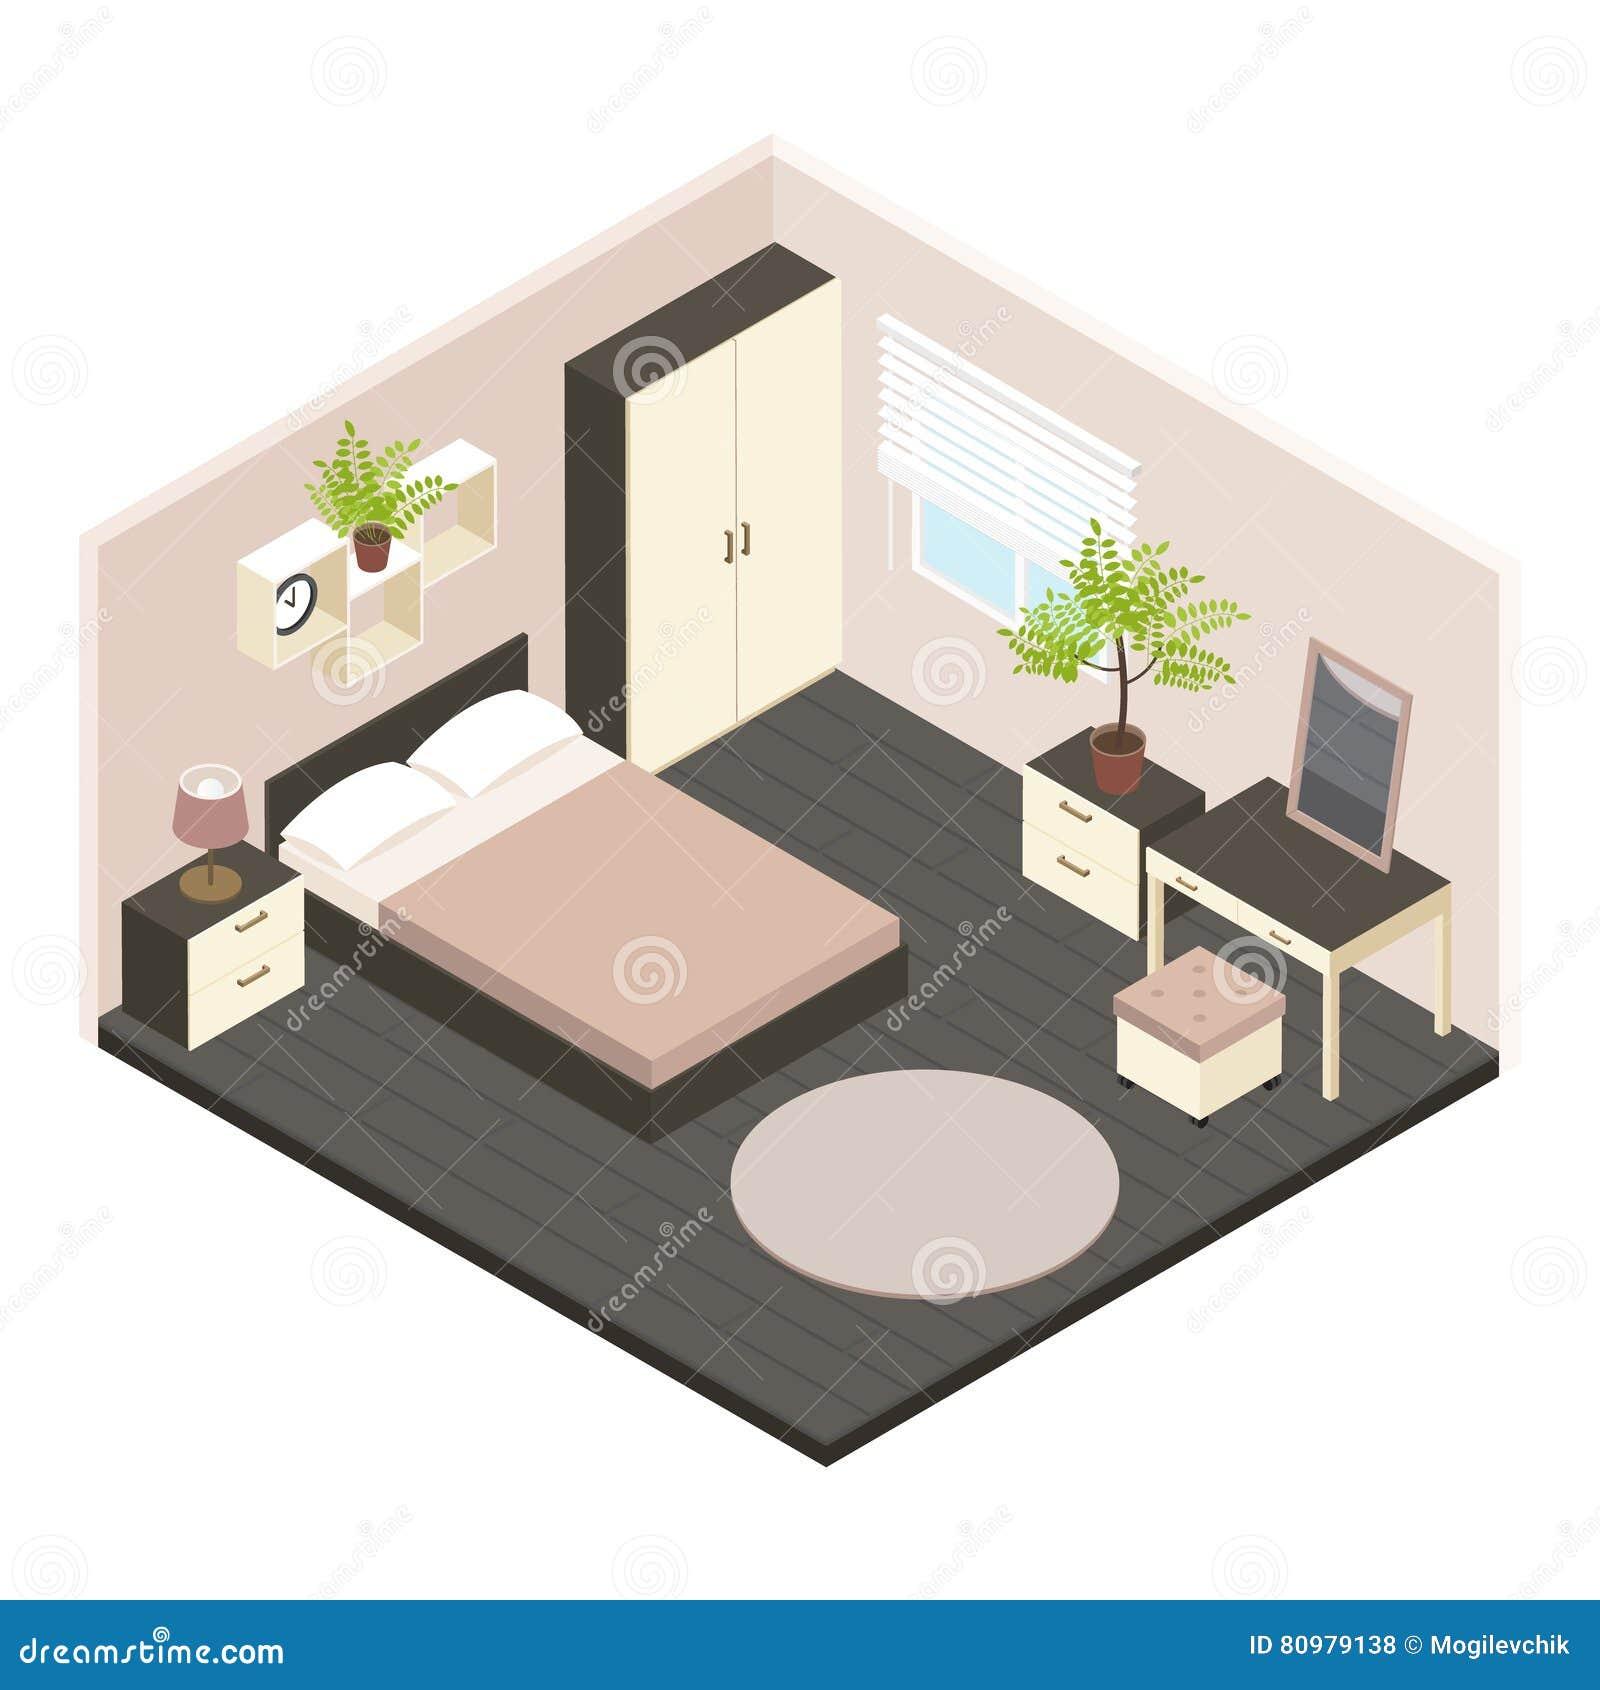 3d isometric bedroom interior stock vector image 80979138 for Plan de chambre 3d